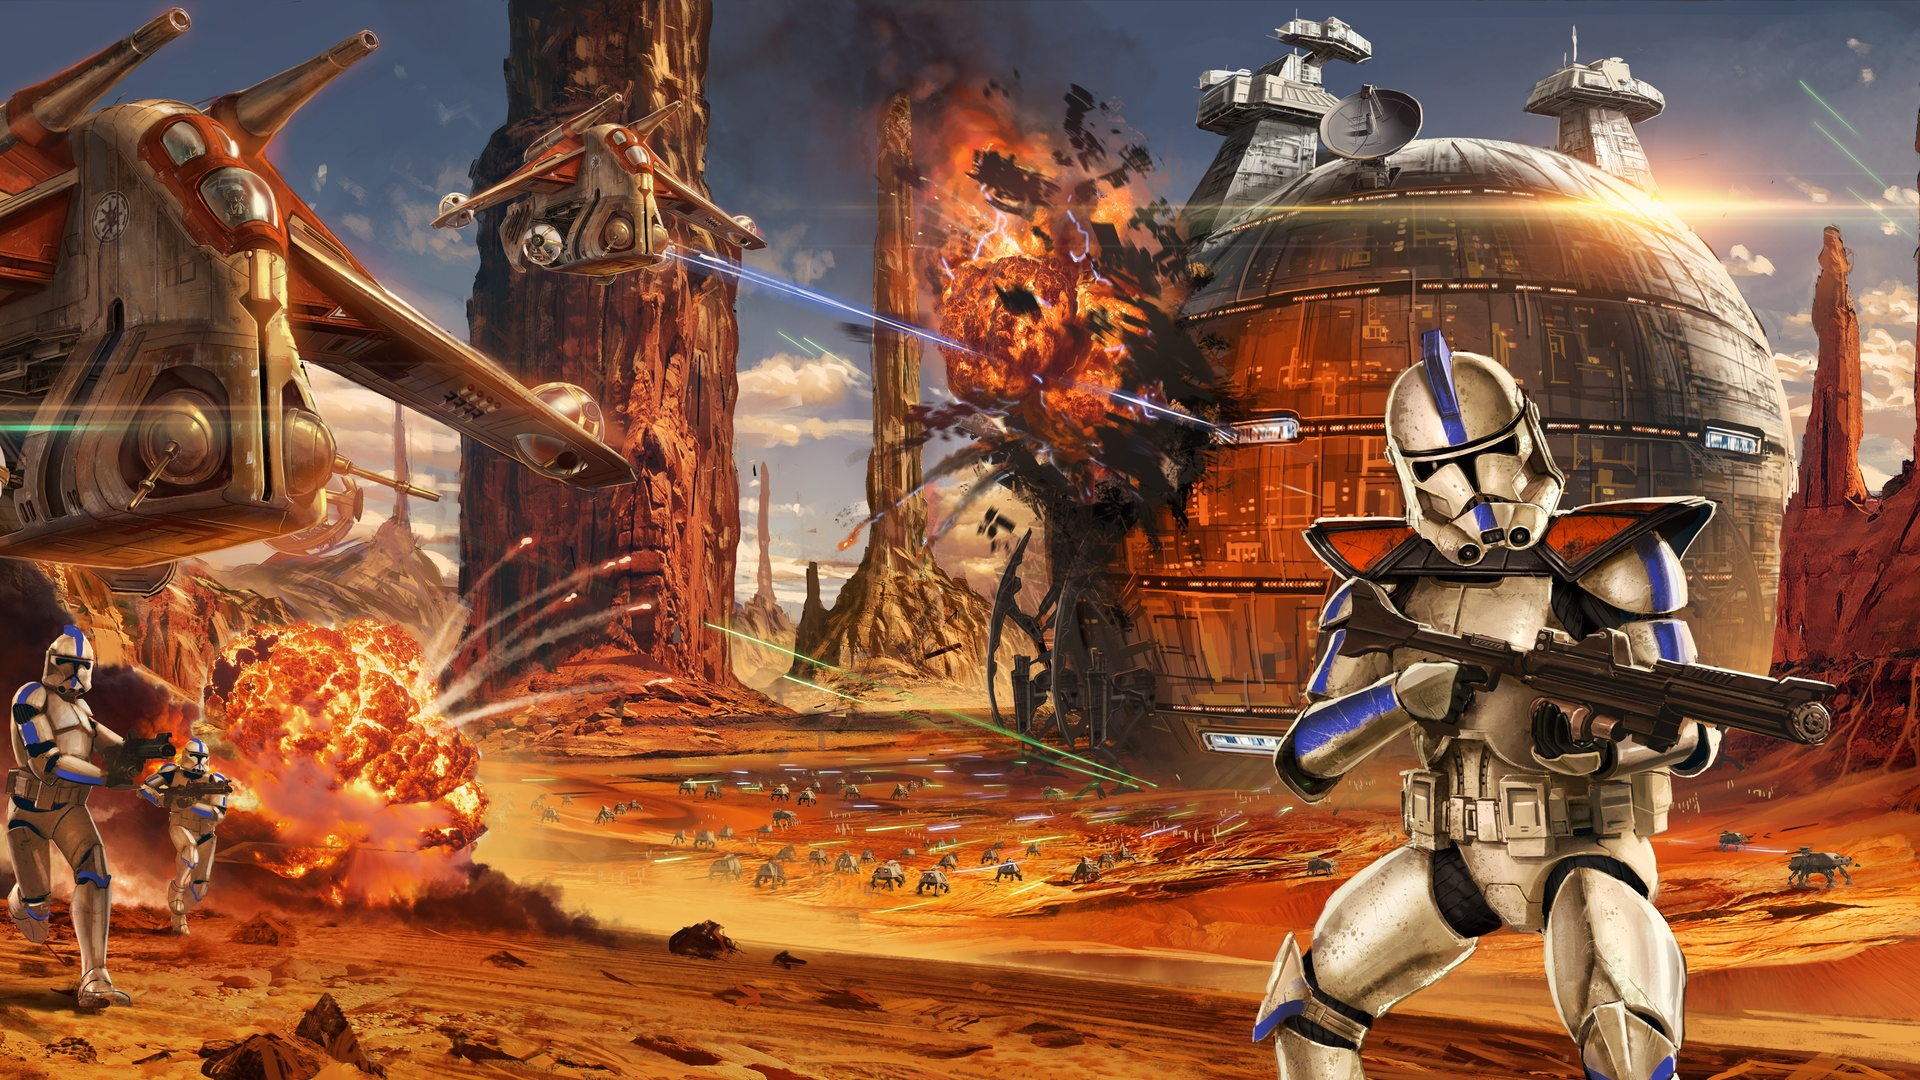 1920x1080 Star Wars Artwork Geonosis Clone Trooper Laptop